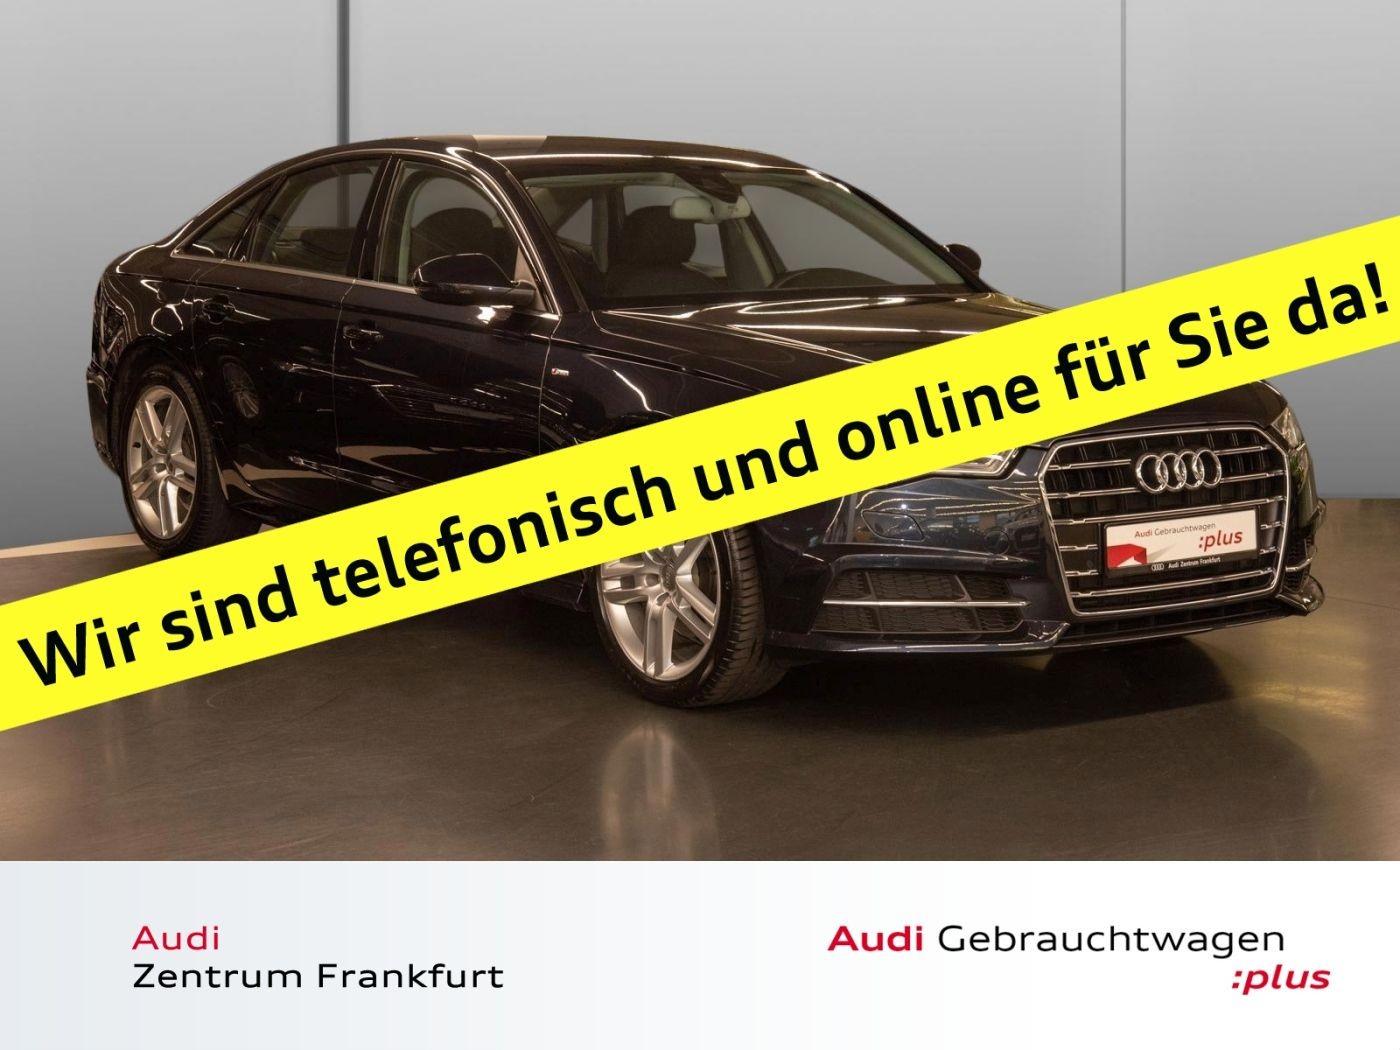 Audi A6 1.8 TFSI ultra S tronic S line Matrix-LED Navi Bose, Jahr 2016, Benzin